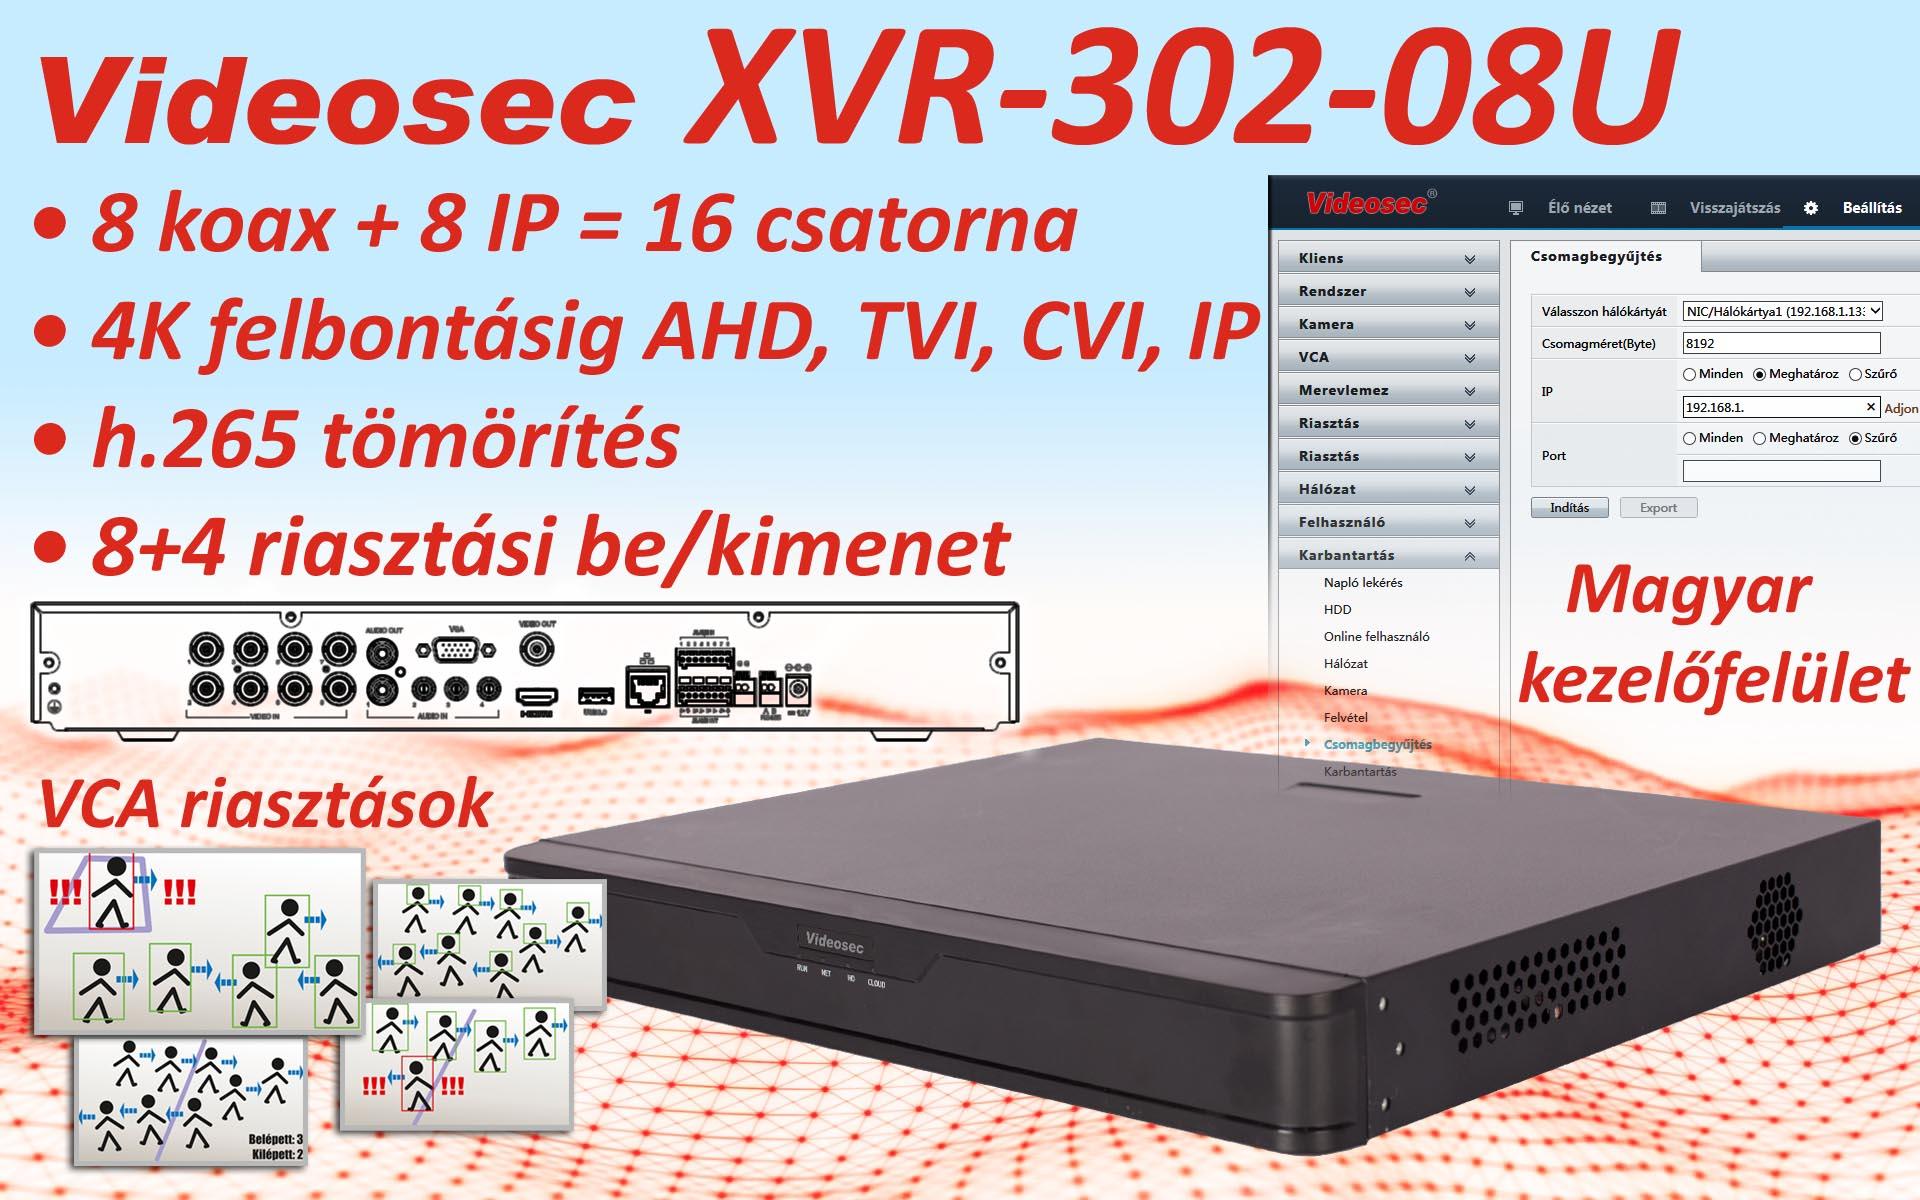 XVR-302-08U